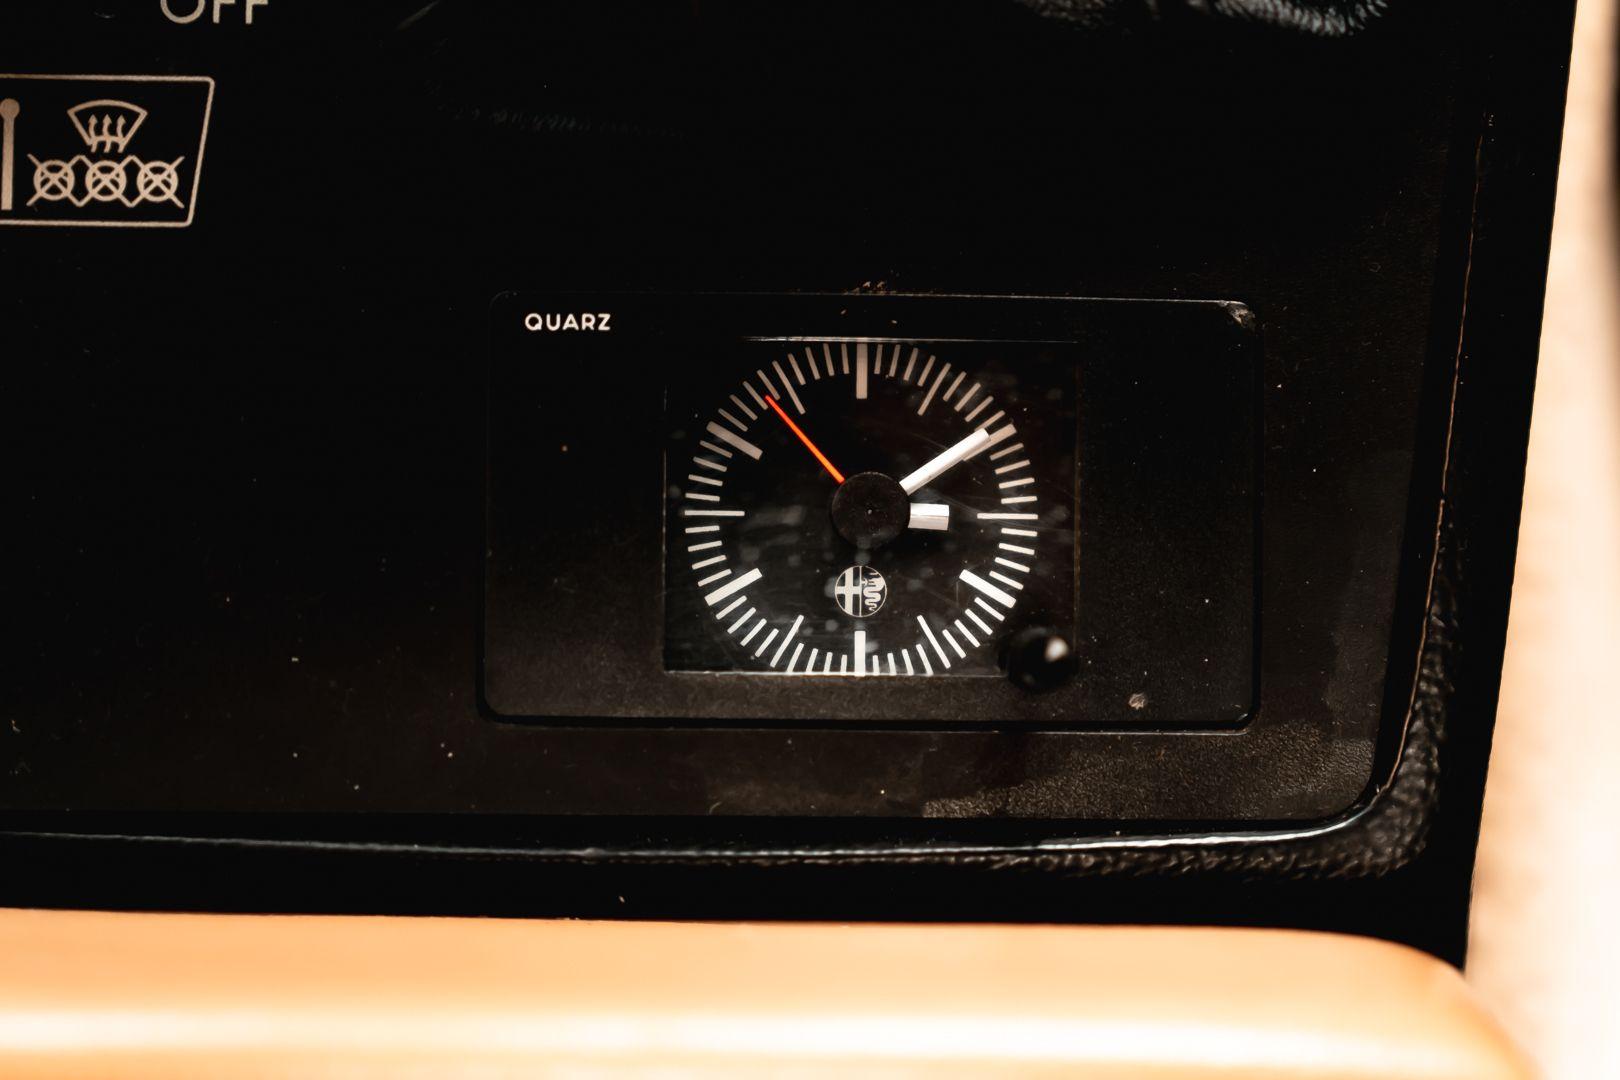 1990 Alfa Romeo Duetto 2000 IV Serie 79781